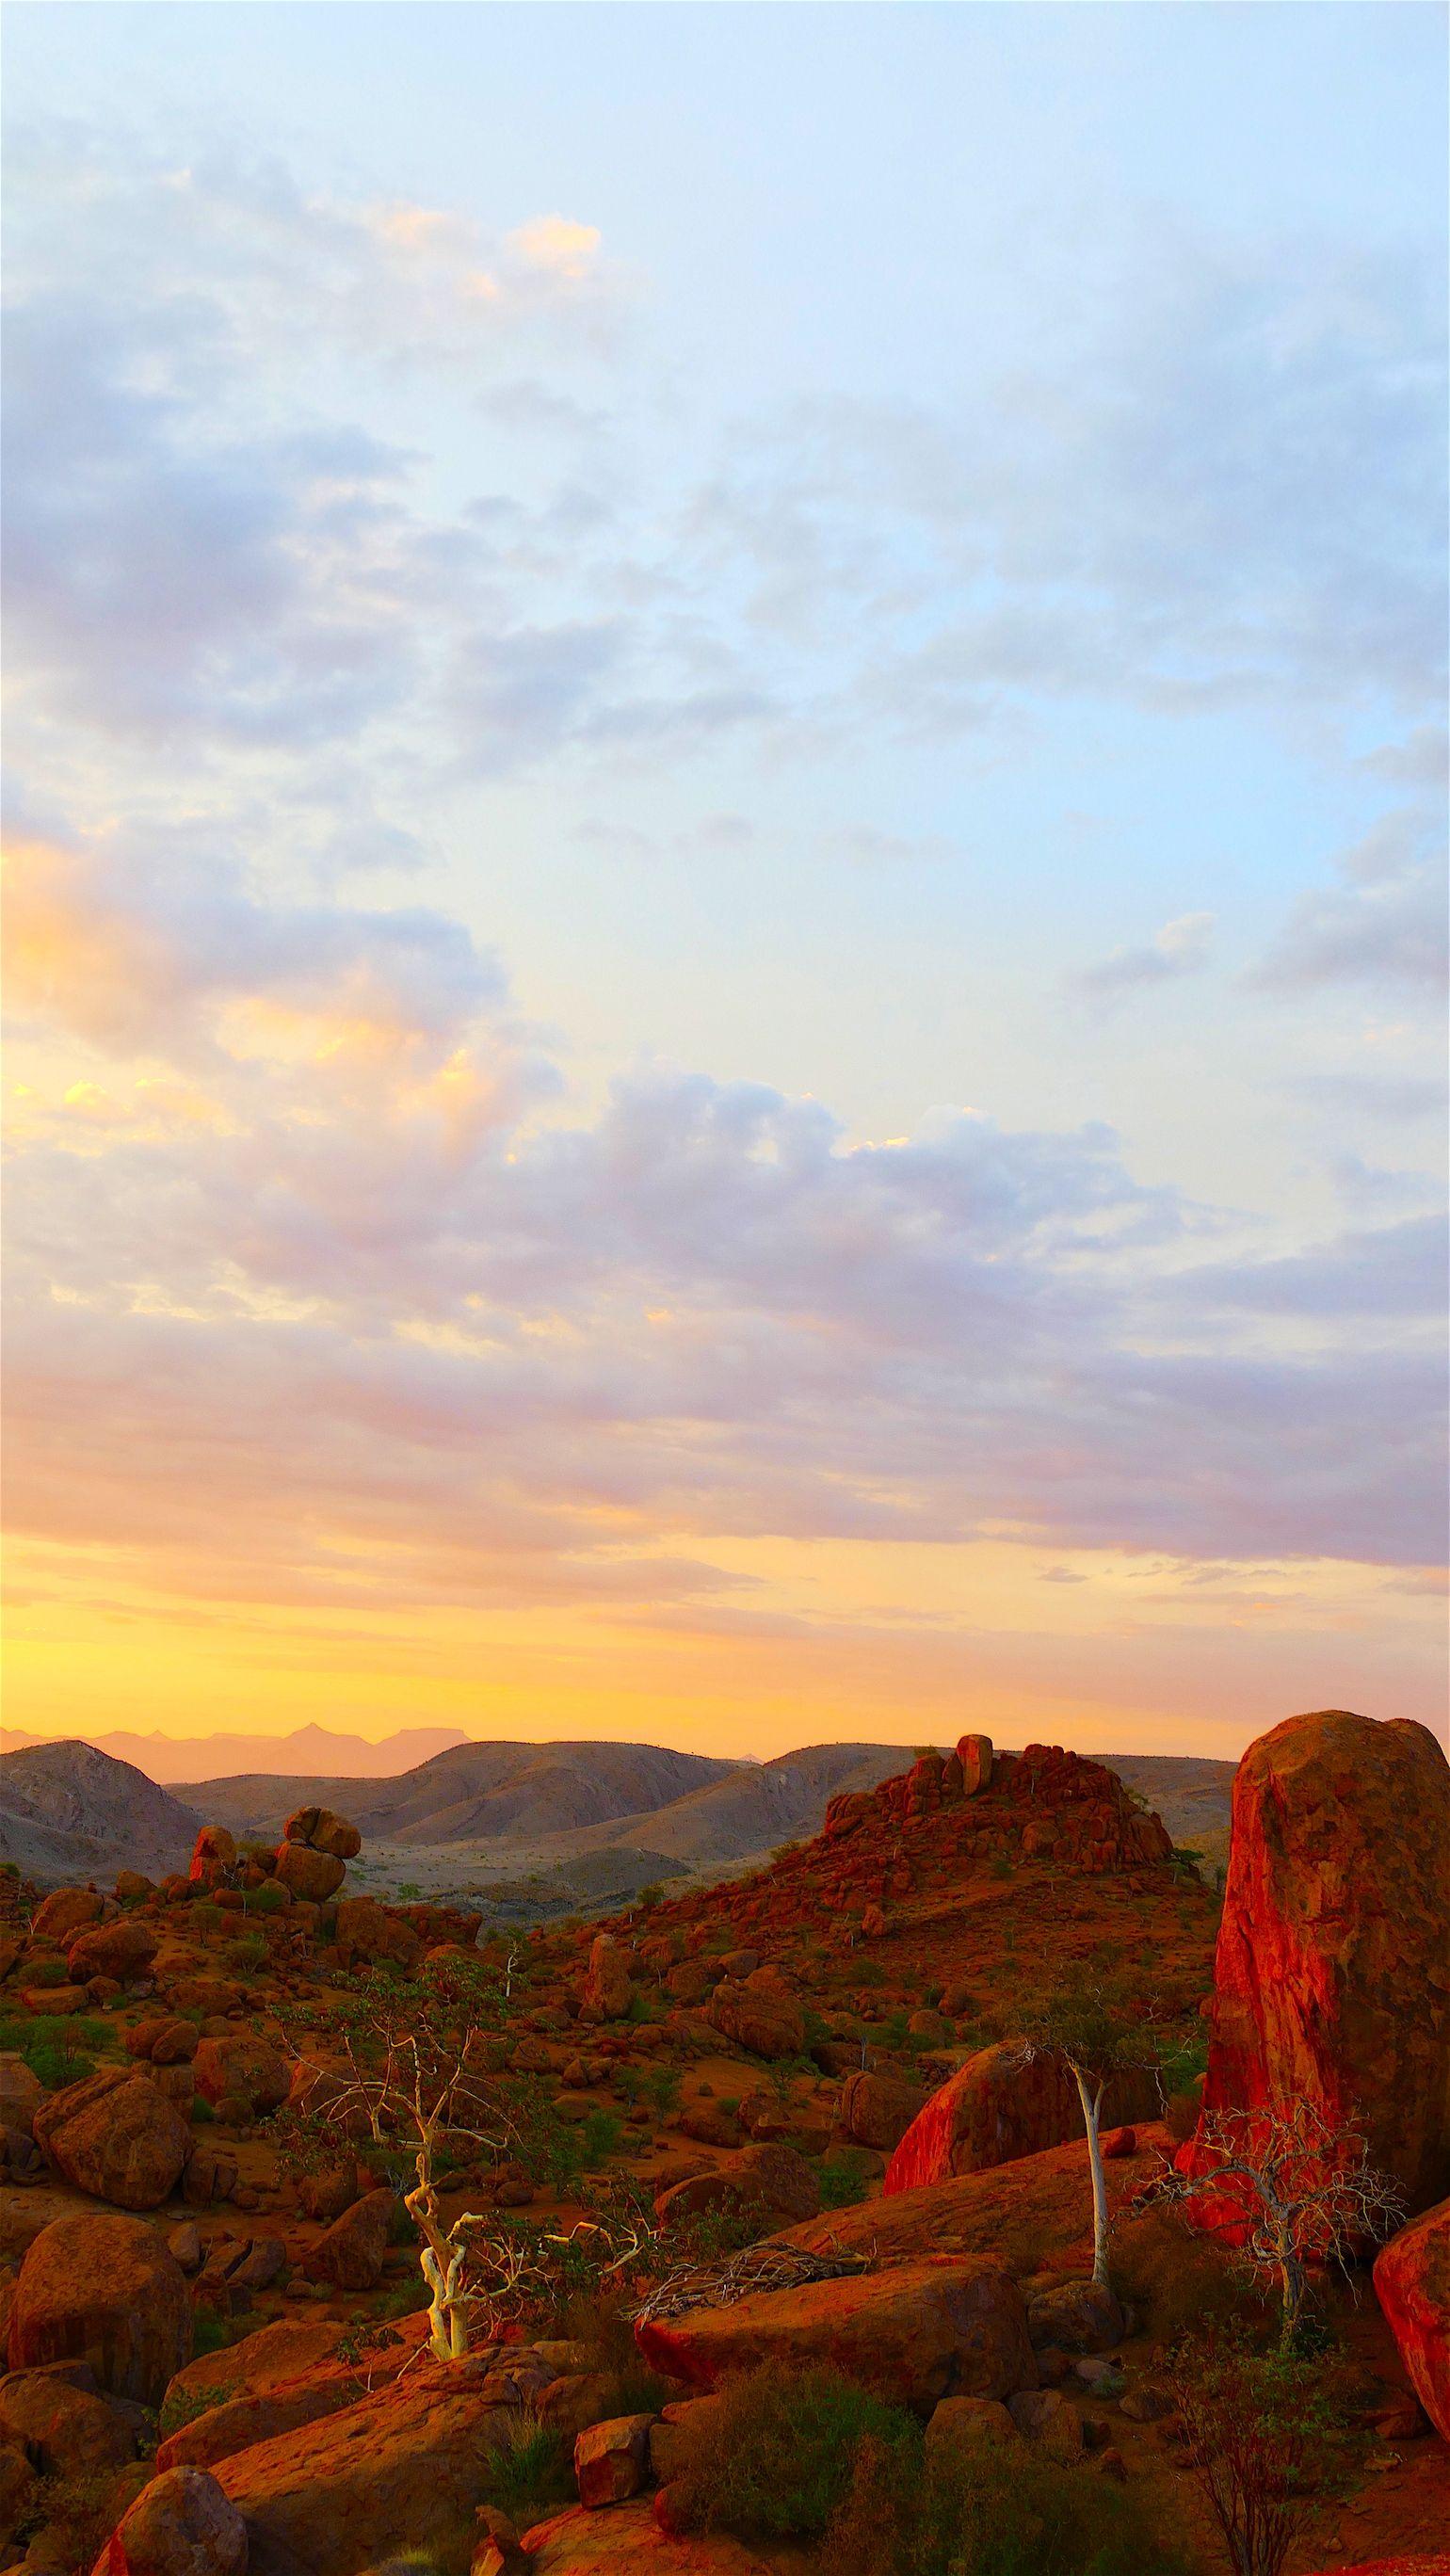 #Mountain #Sunset #Namibia #travel #Kaokoland